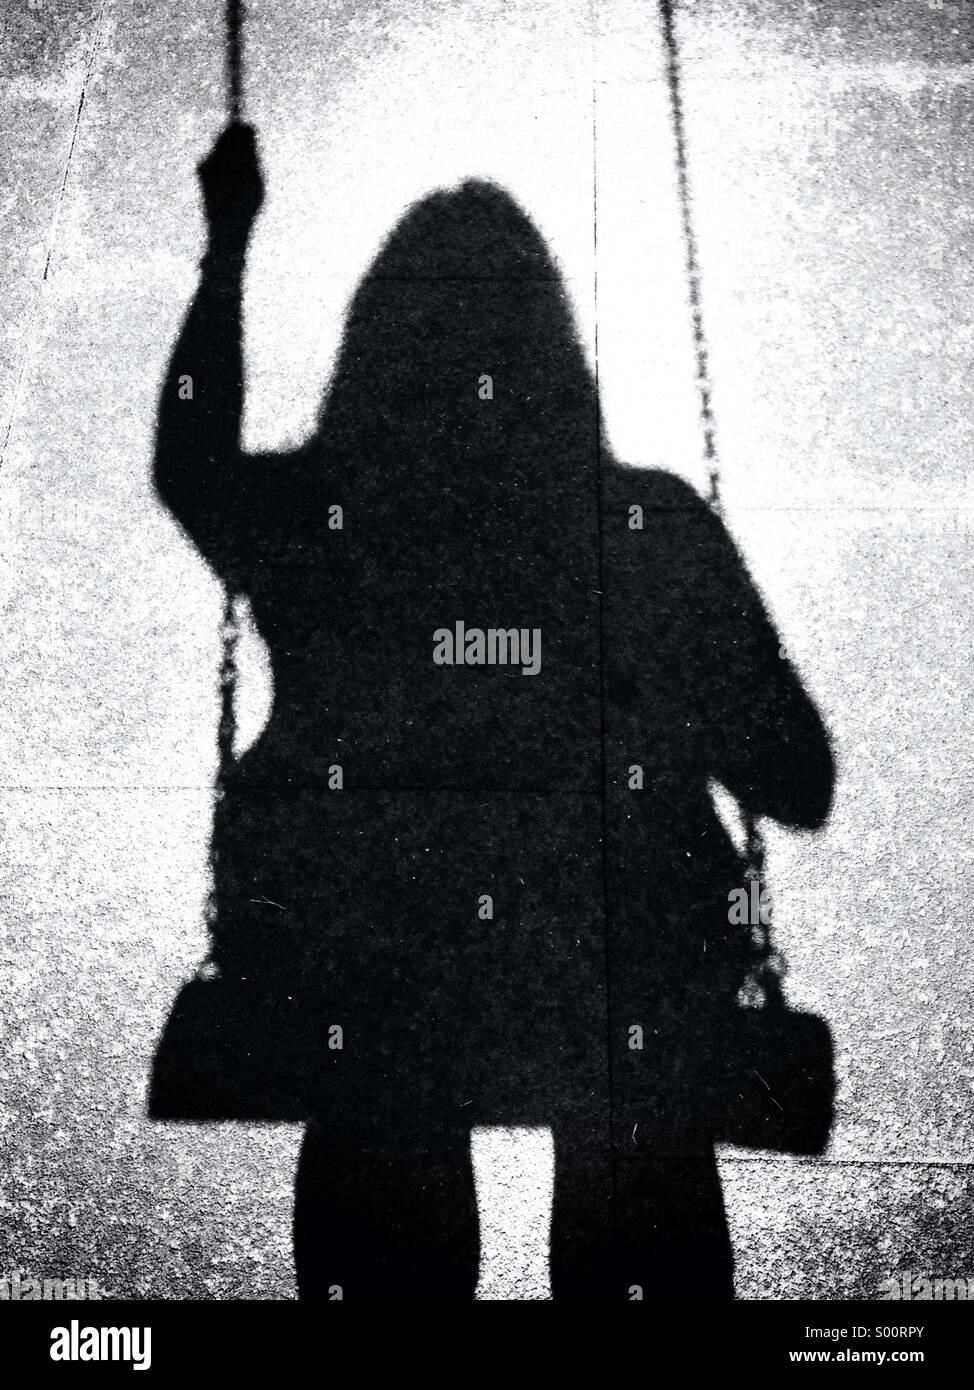 Swinging shadow - Stock Image